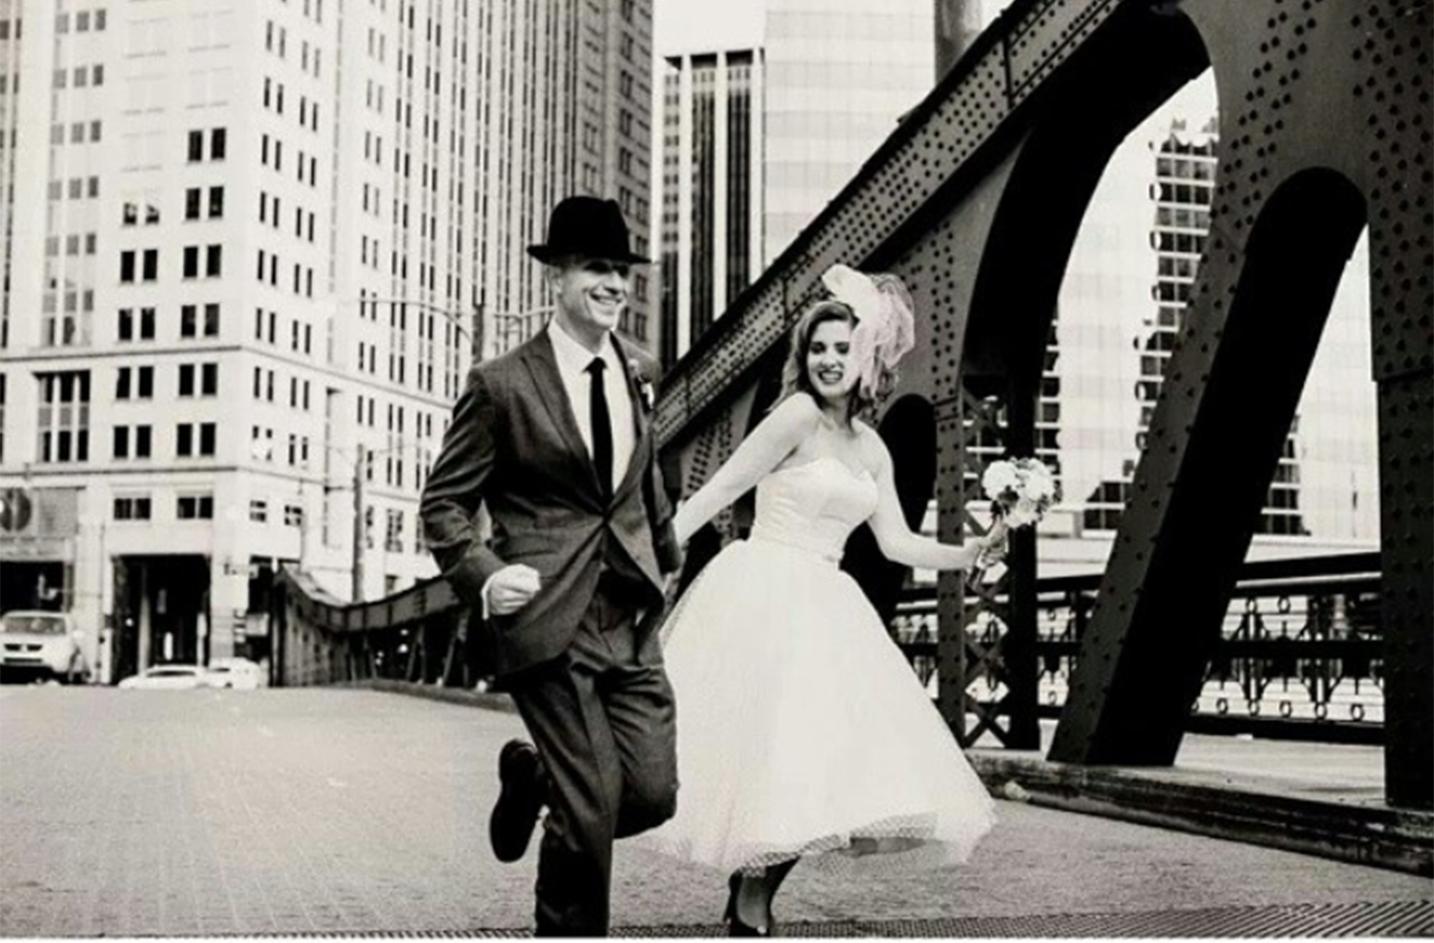 Newlyweds. July 7, 2012 | Chicago